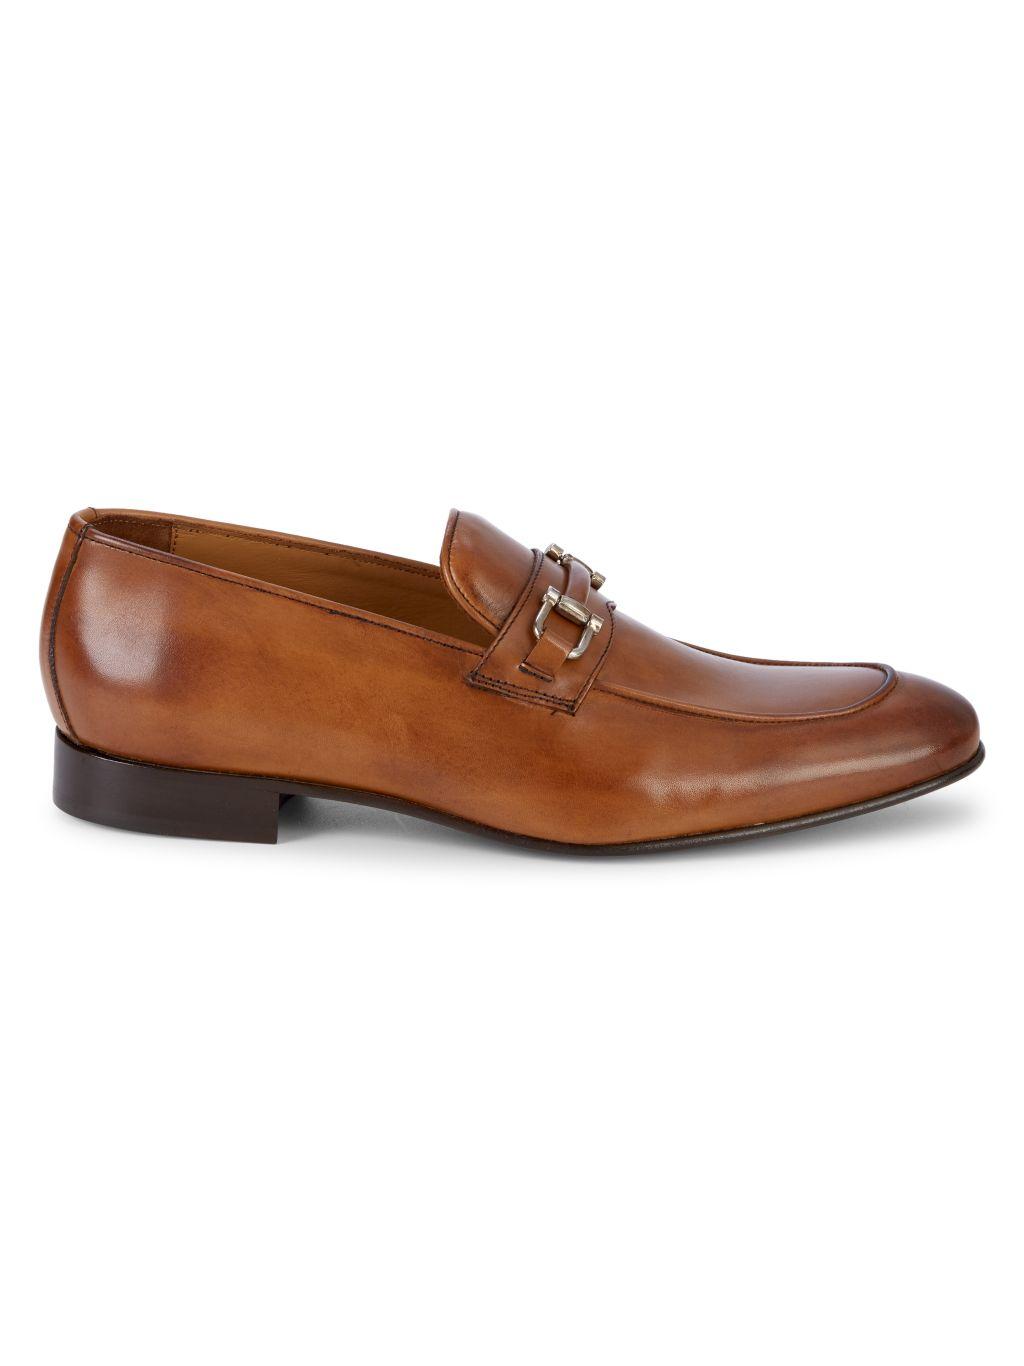 Massimo Matteo Leather Bit Loafers